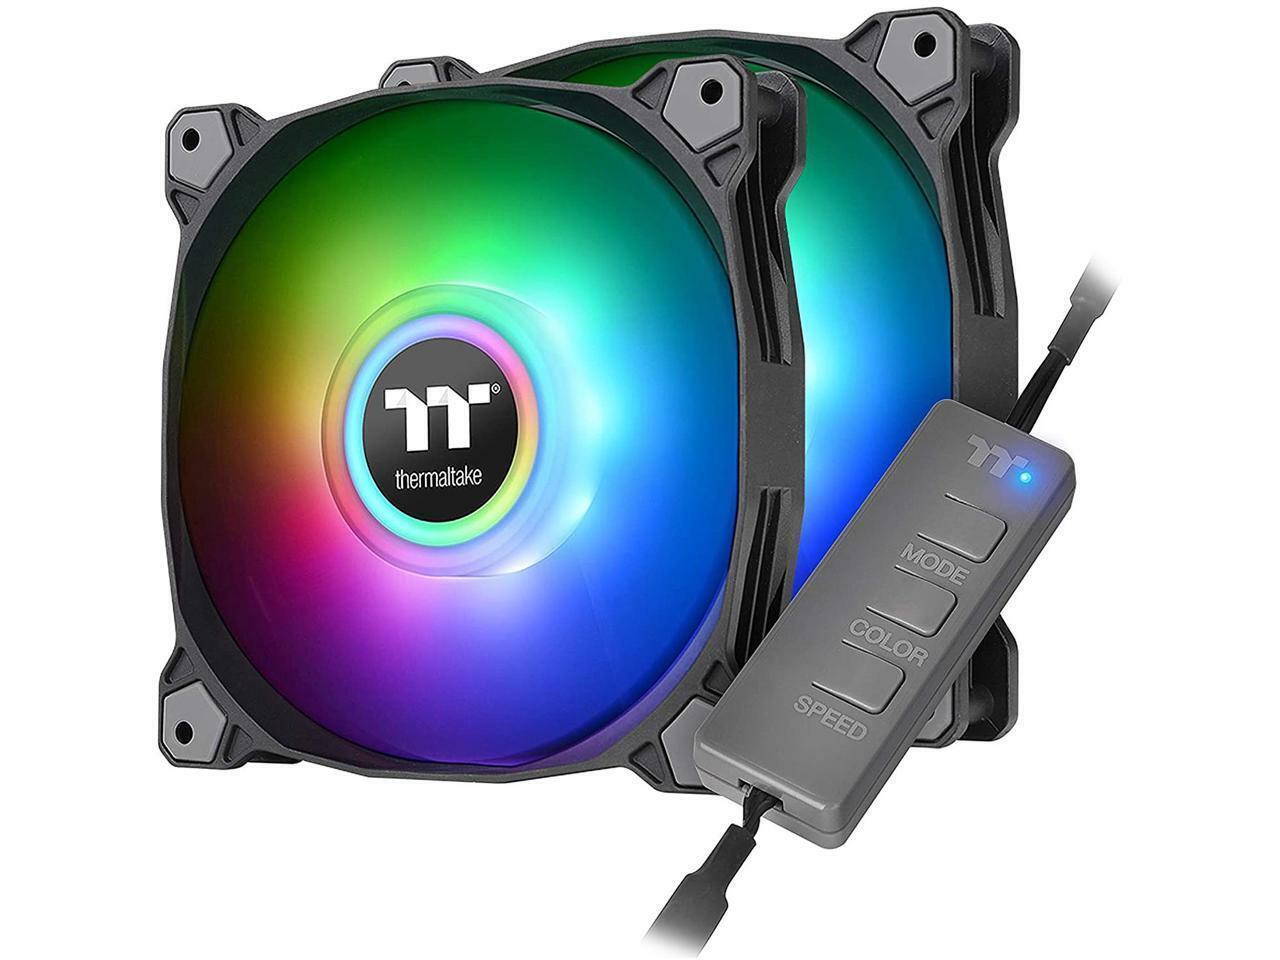 Thermaltake Pure Duo 120mm 16.8 Million RGB Color 5V ARGB Motherboard Sync 2 Lig